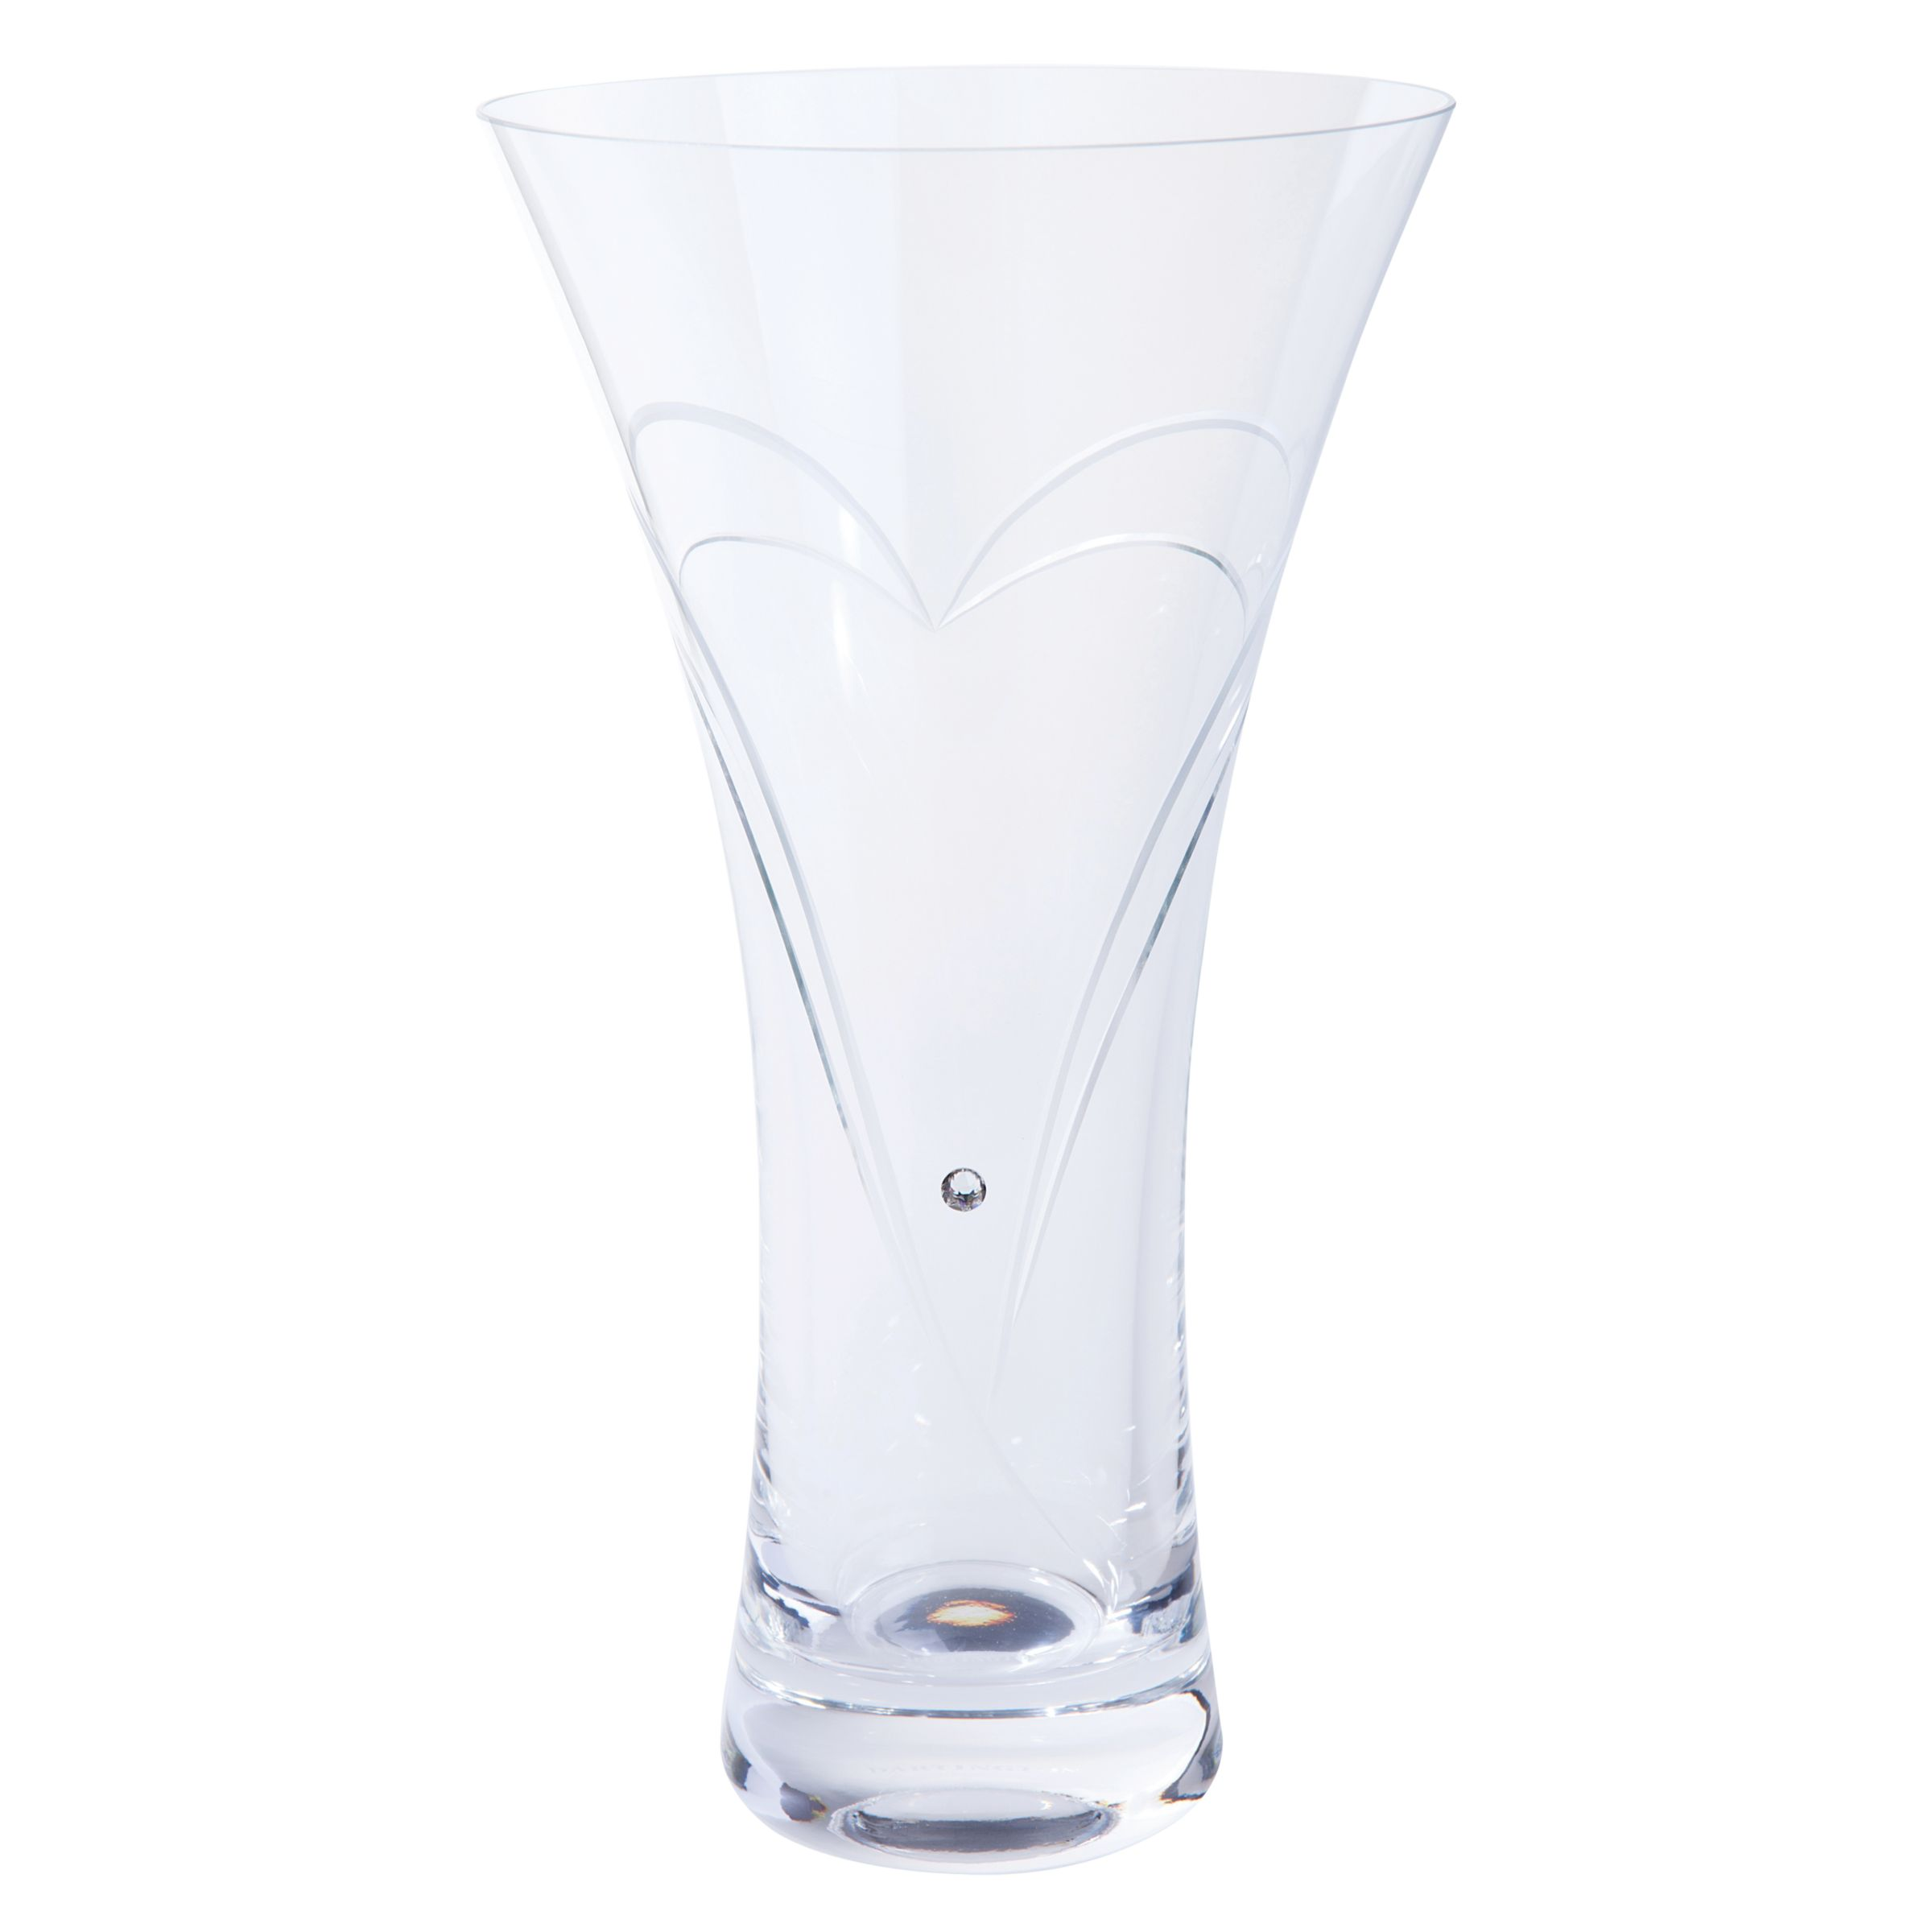 Dartington Crystal Dartington Crystal Romance Vase, Large, Clear